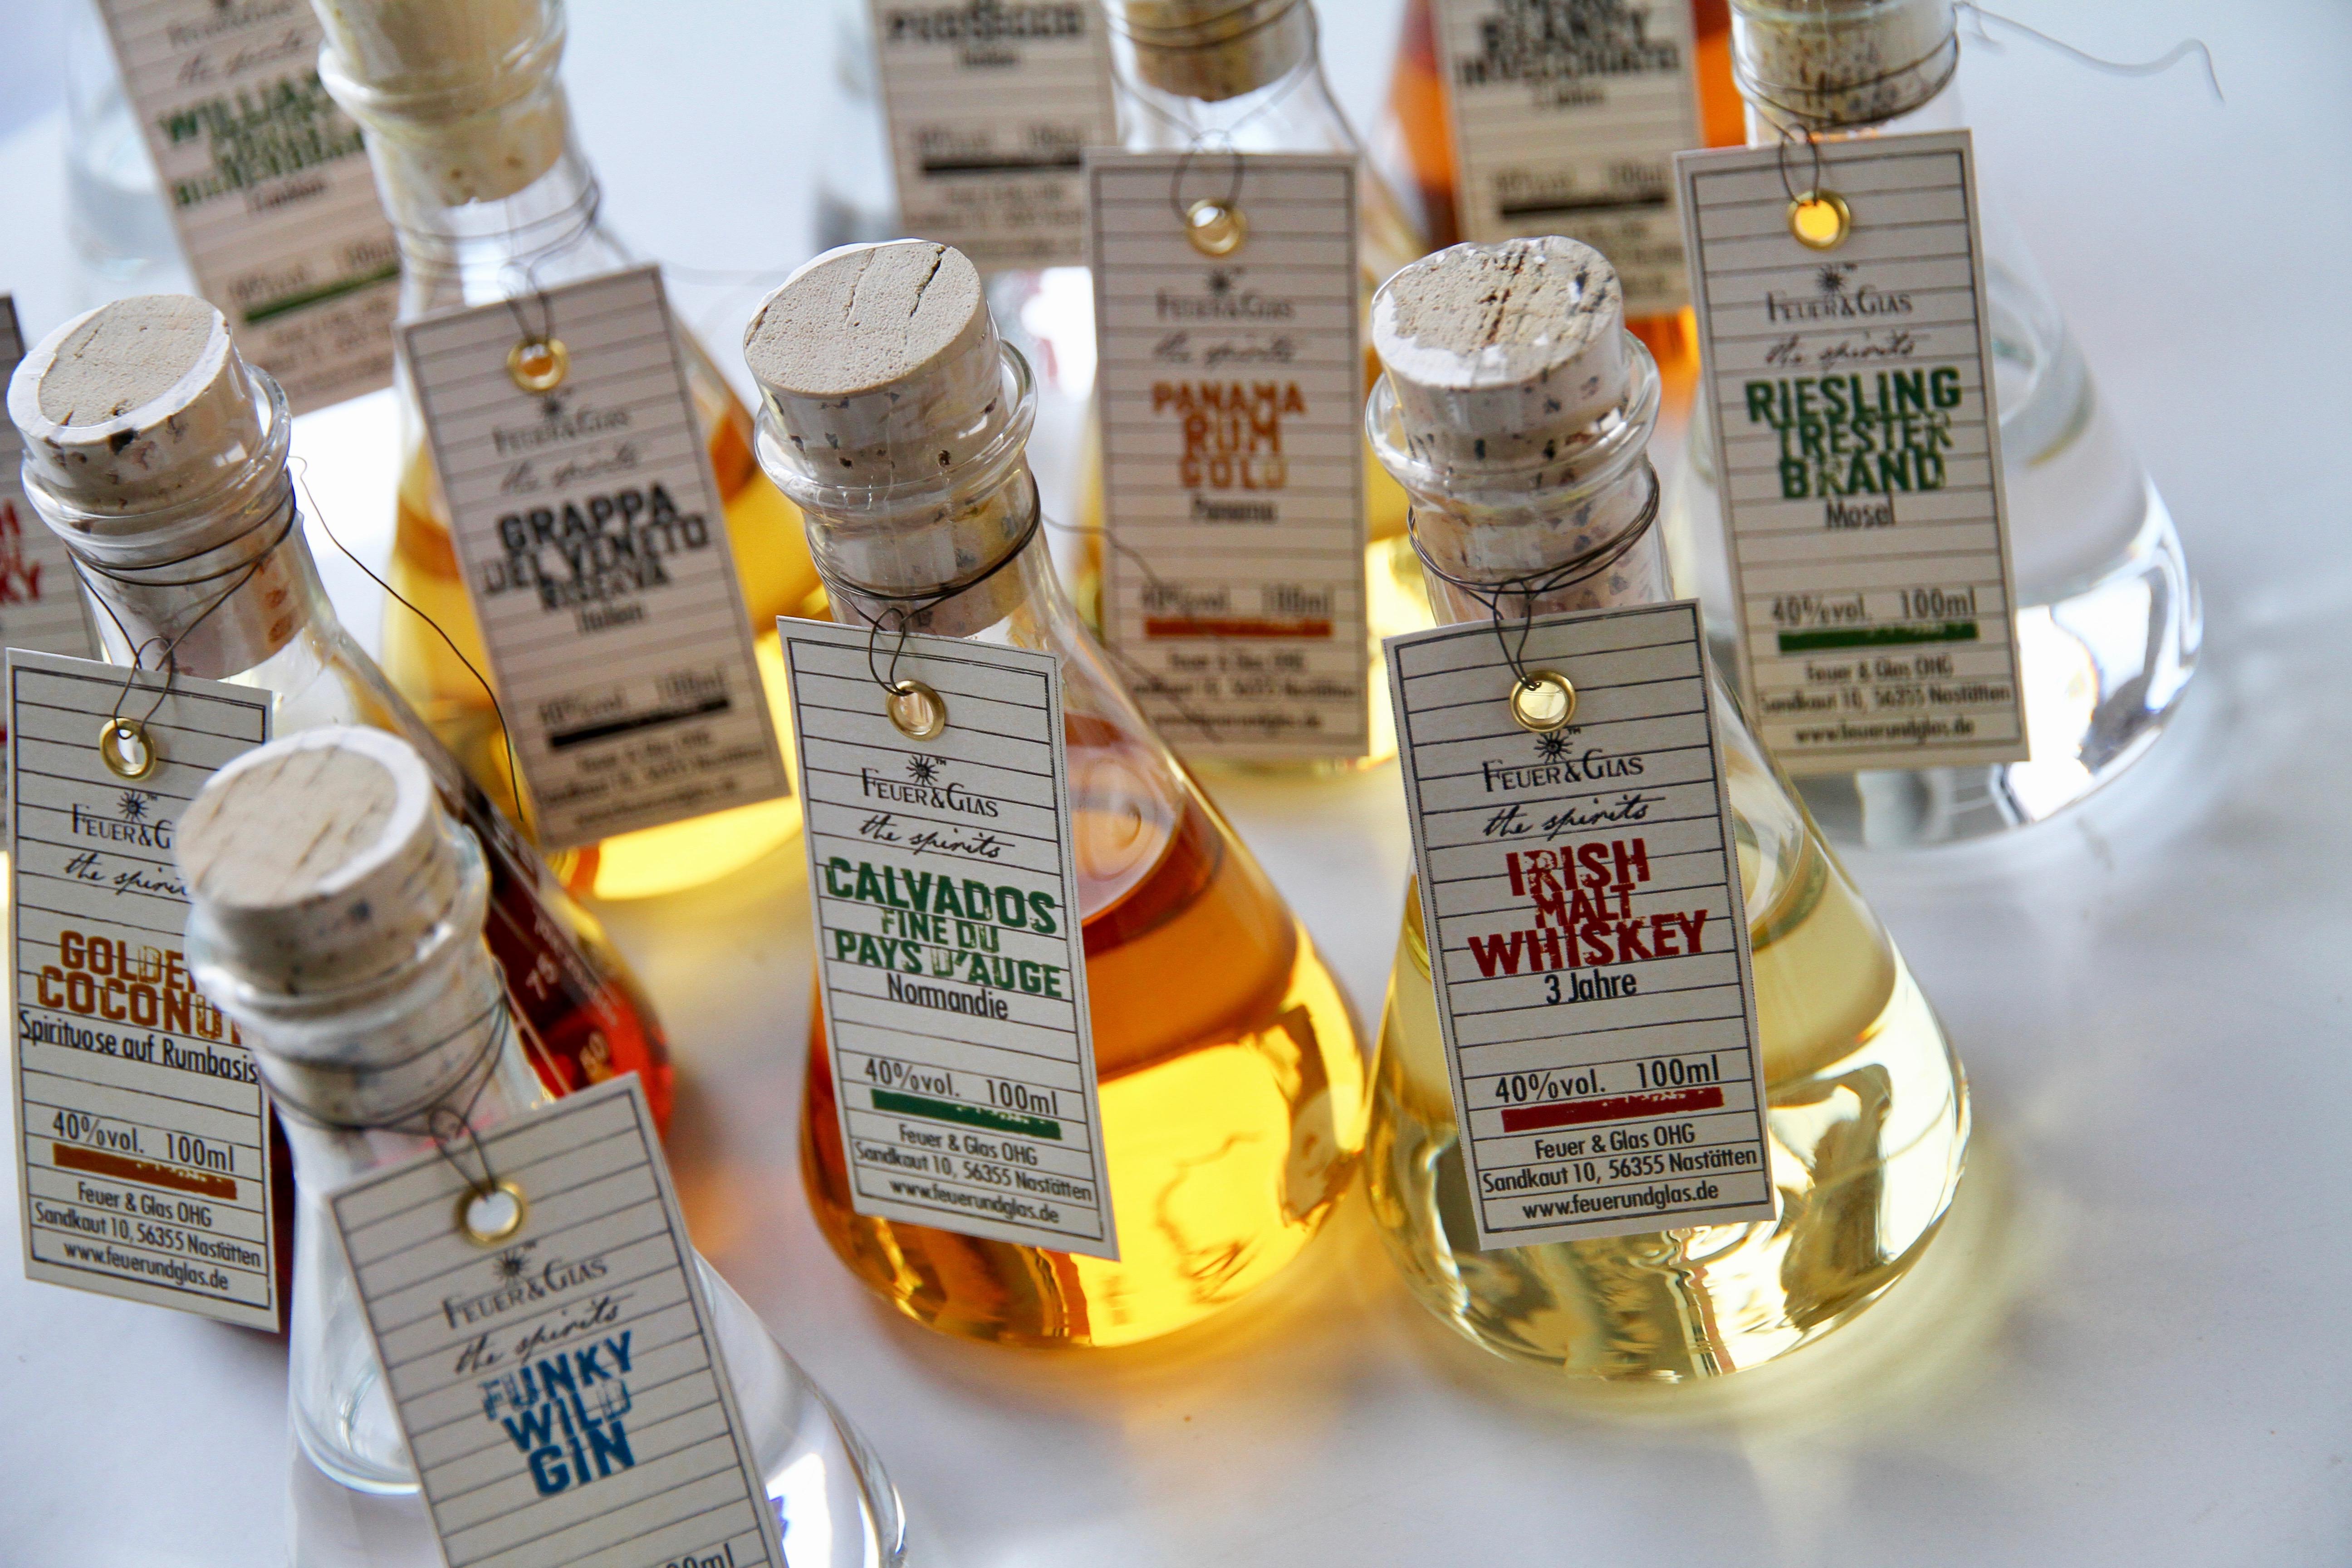 Scotch Highland Whisky, 100 ml, 40%  VOL